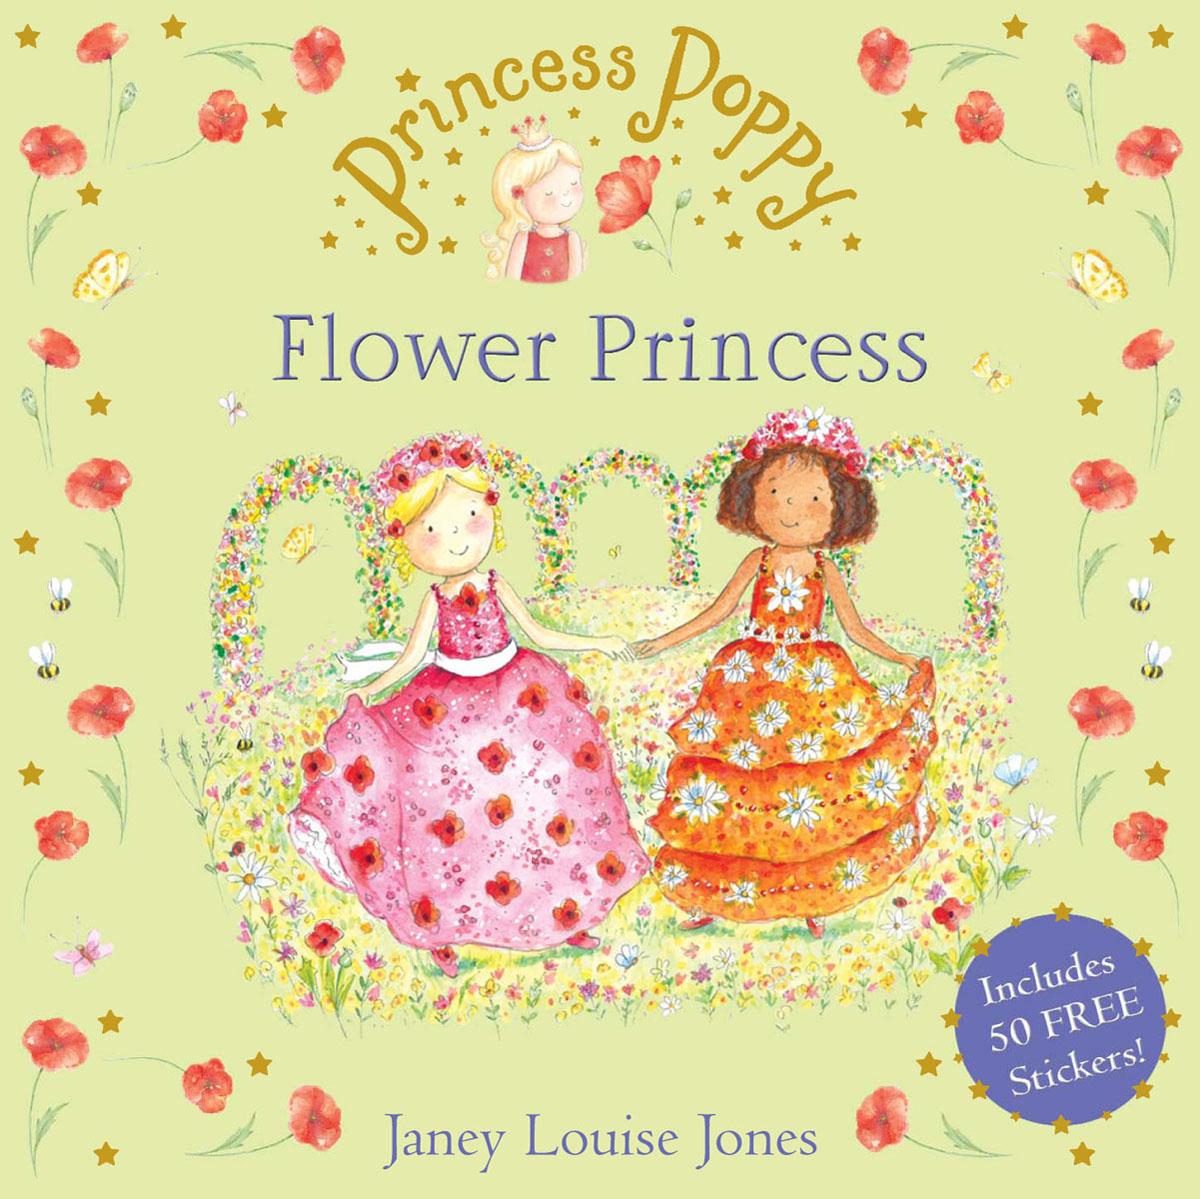 Princess Poppy: The Flower Princess